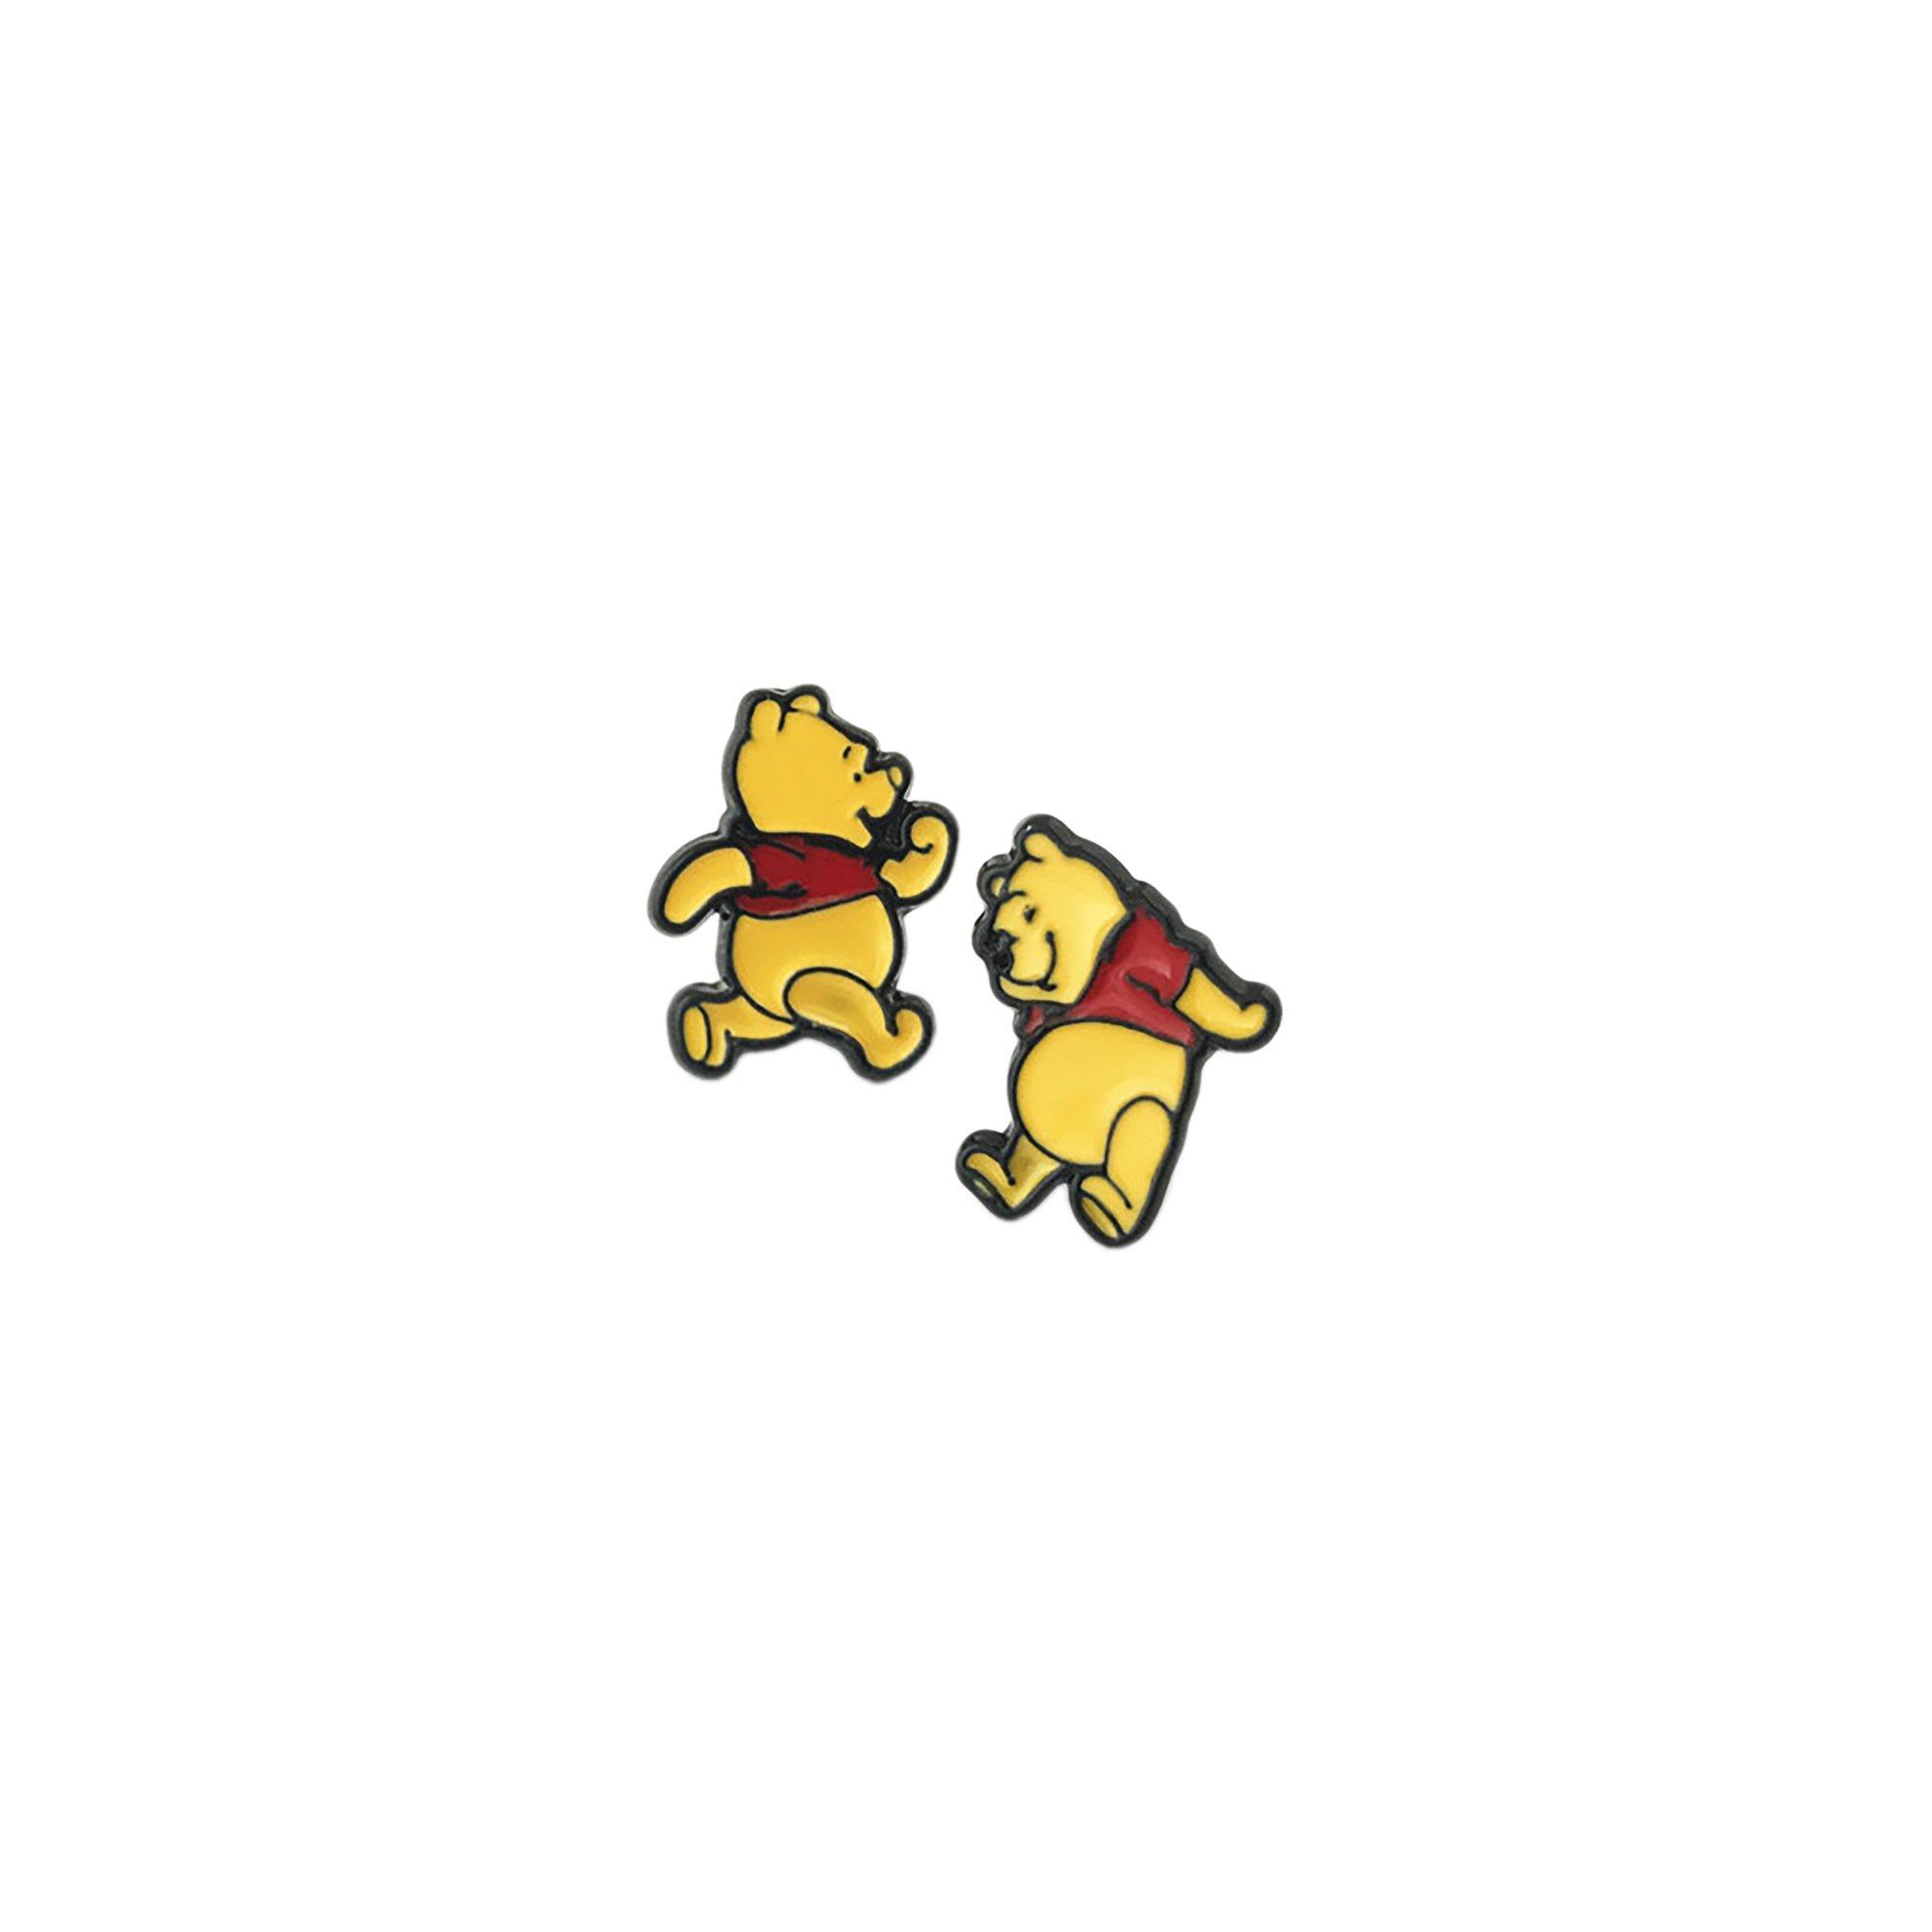 Winnie The Pooh Silver Tone Cartoon Comic Logo Post Earrings w/Gift Box by Superheroes Brand